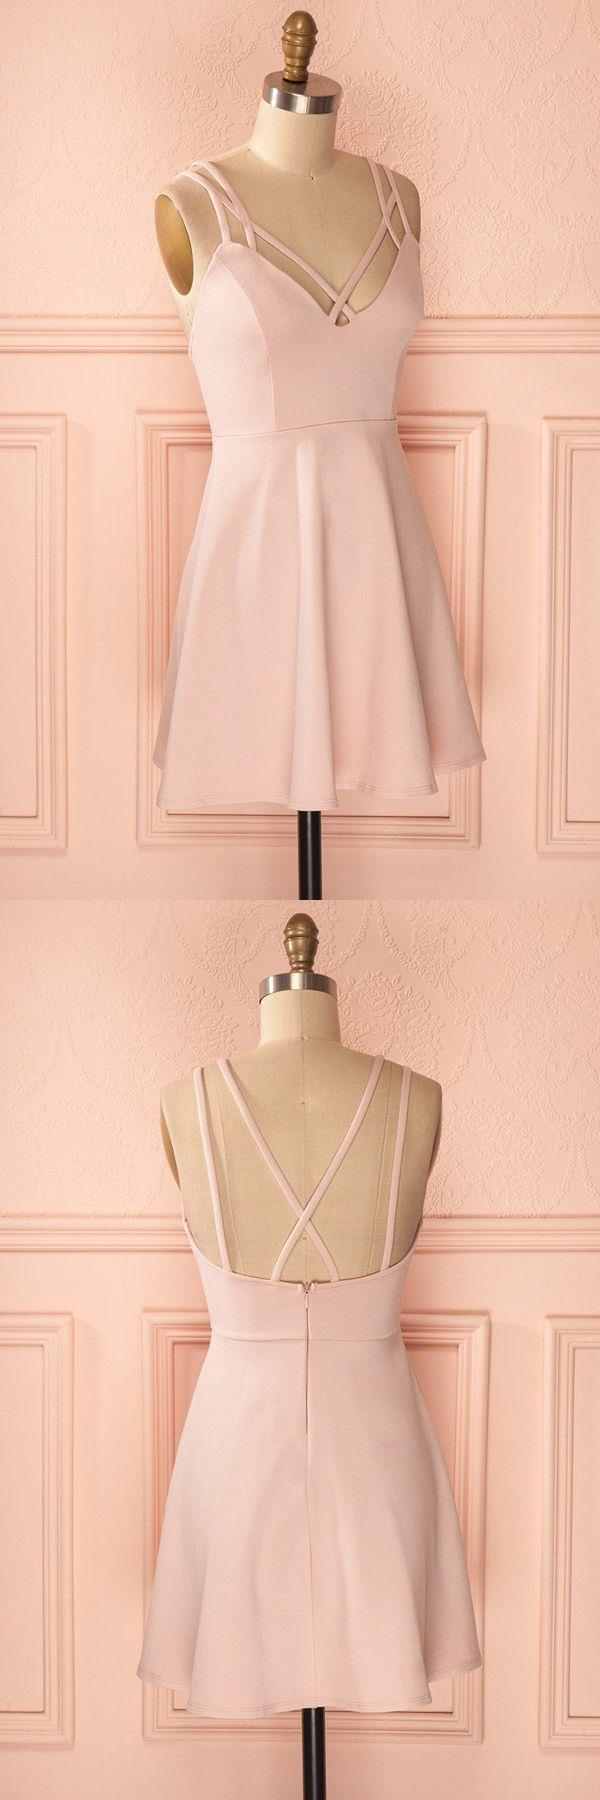 Hochzeit - A-Line Straps Criss-Cross Straps Short Pink Satin Homecoming Dress